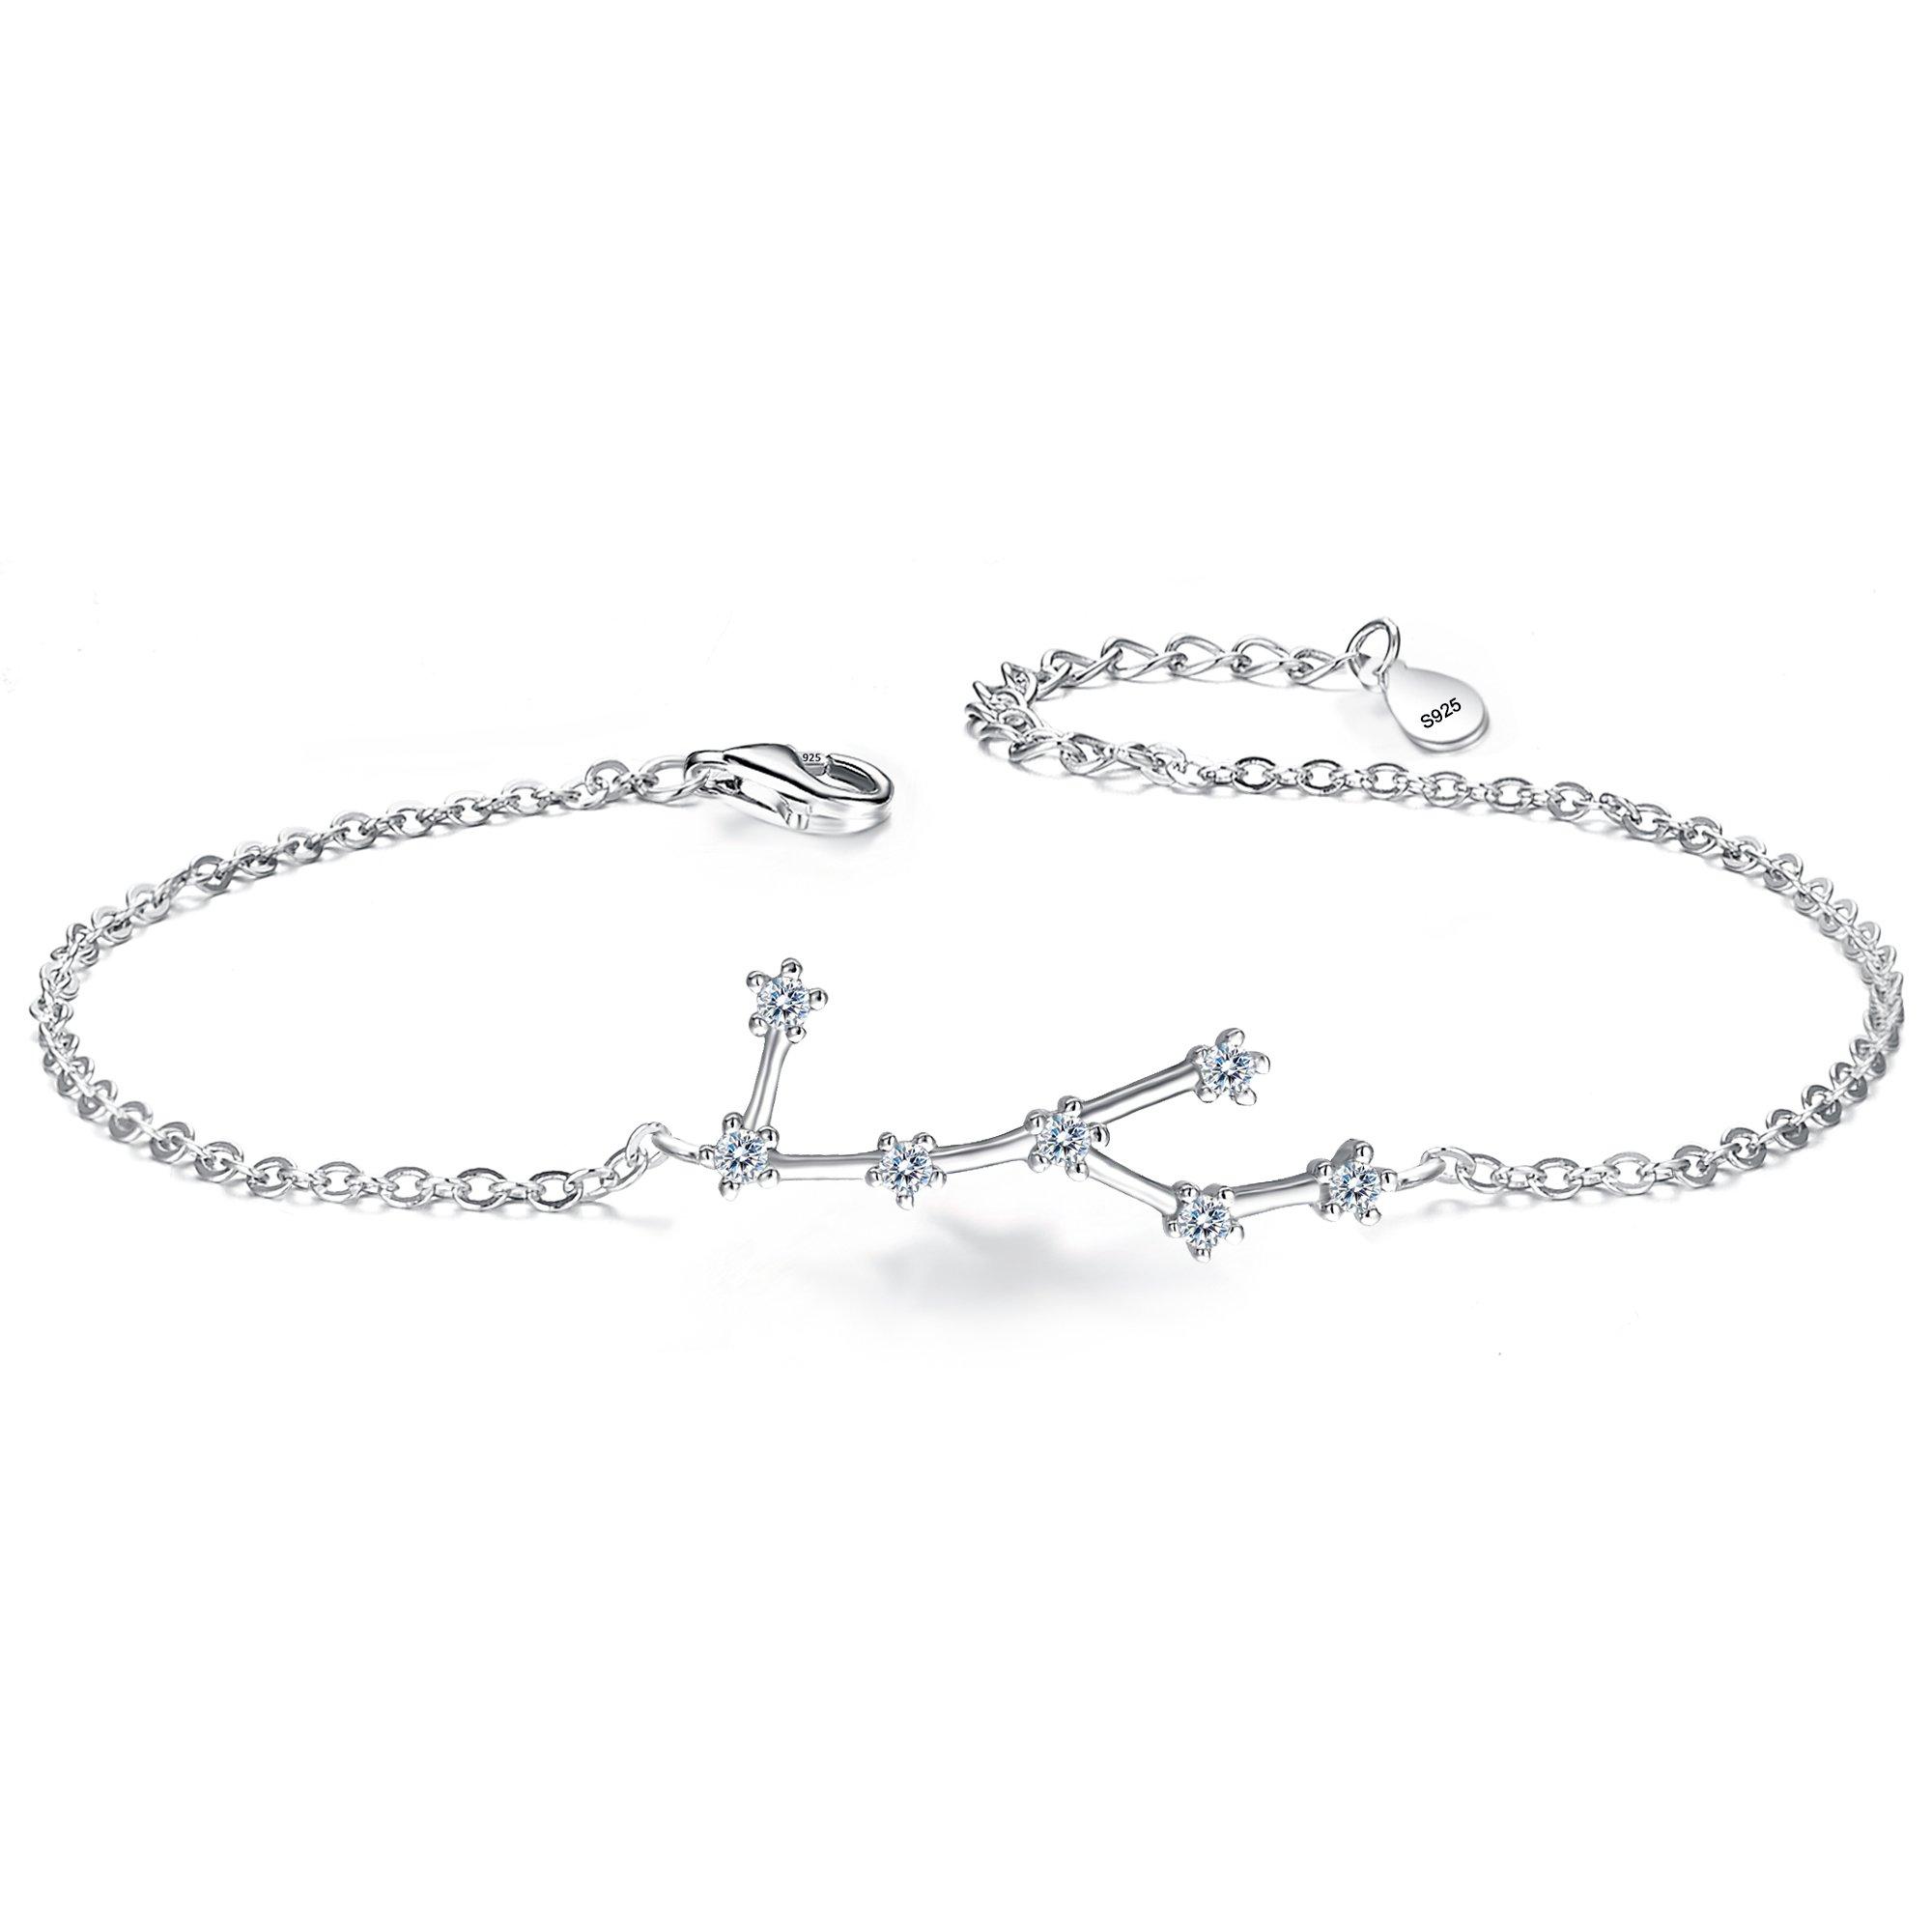 BriLove 925 Sterling Silver Bracelet -Virgo Constellation Zodiac 12 Horoscope Astrology Women CZ Link Bracelet Clear April Birthstone